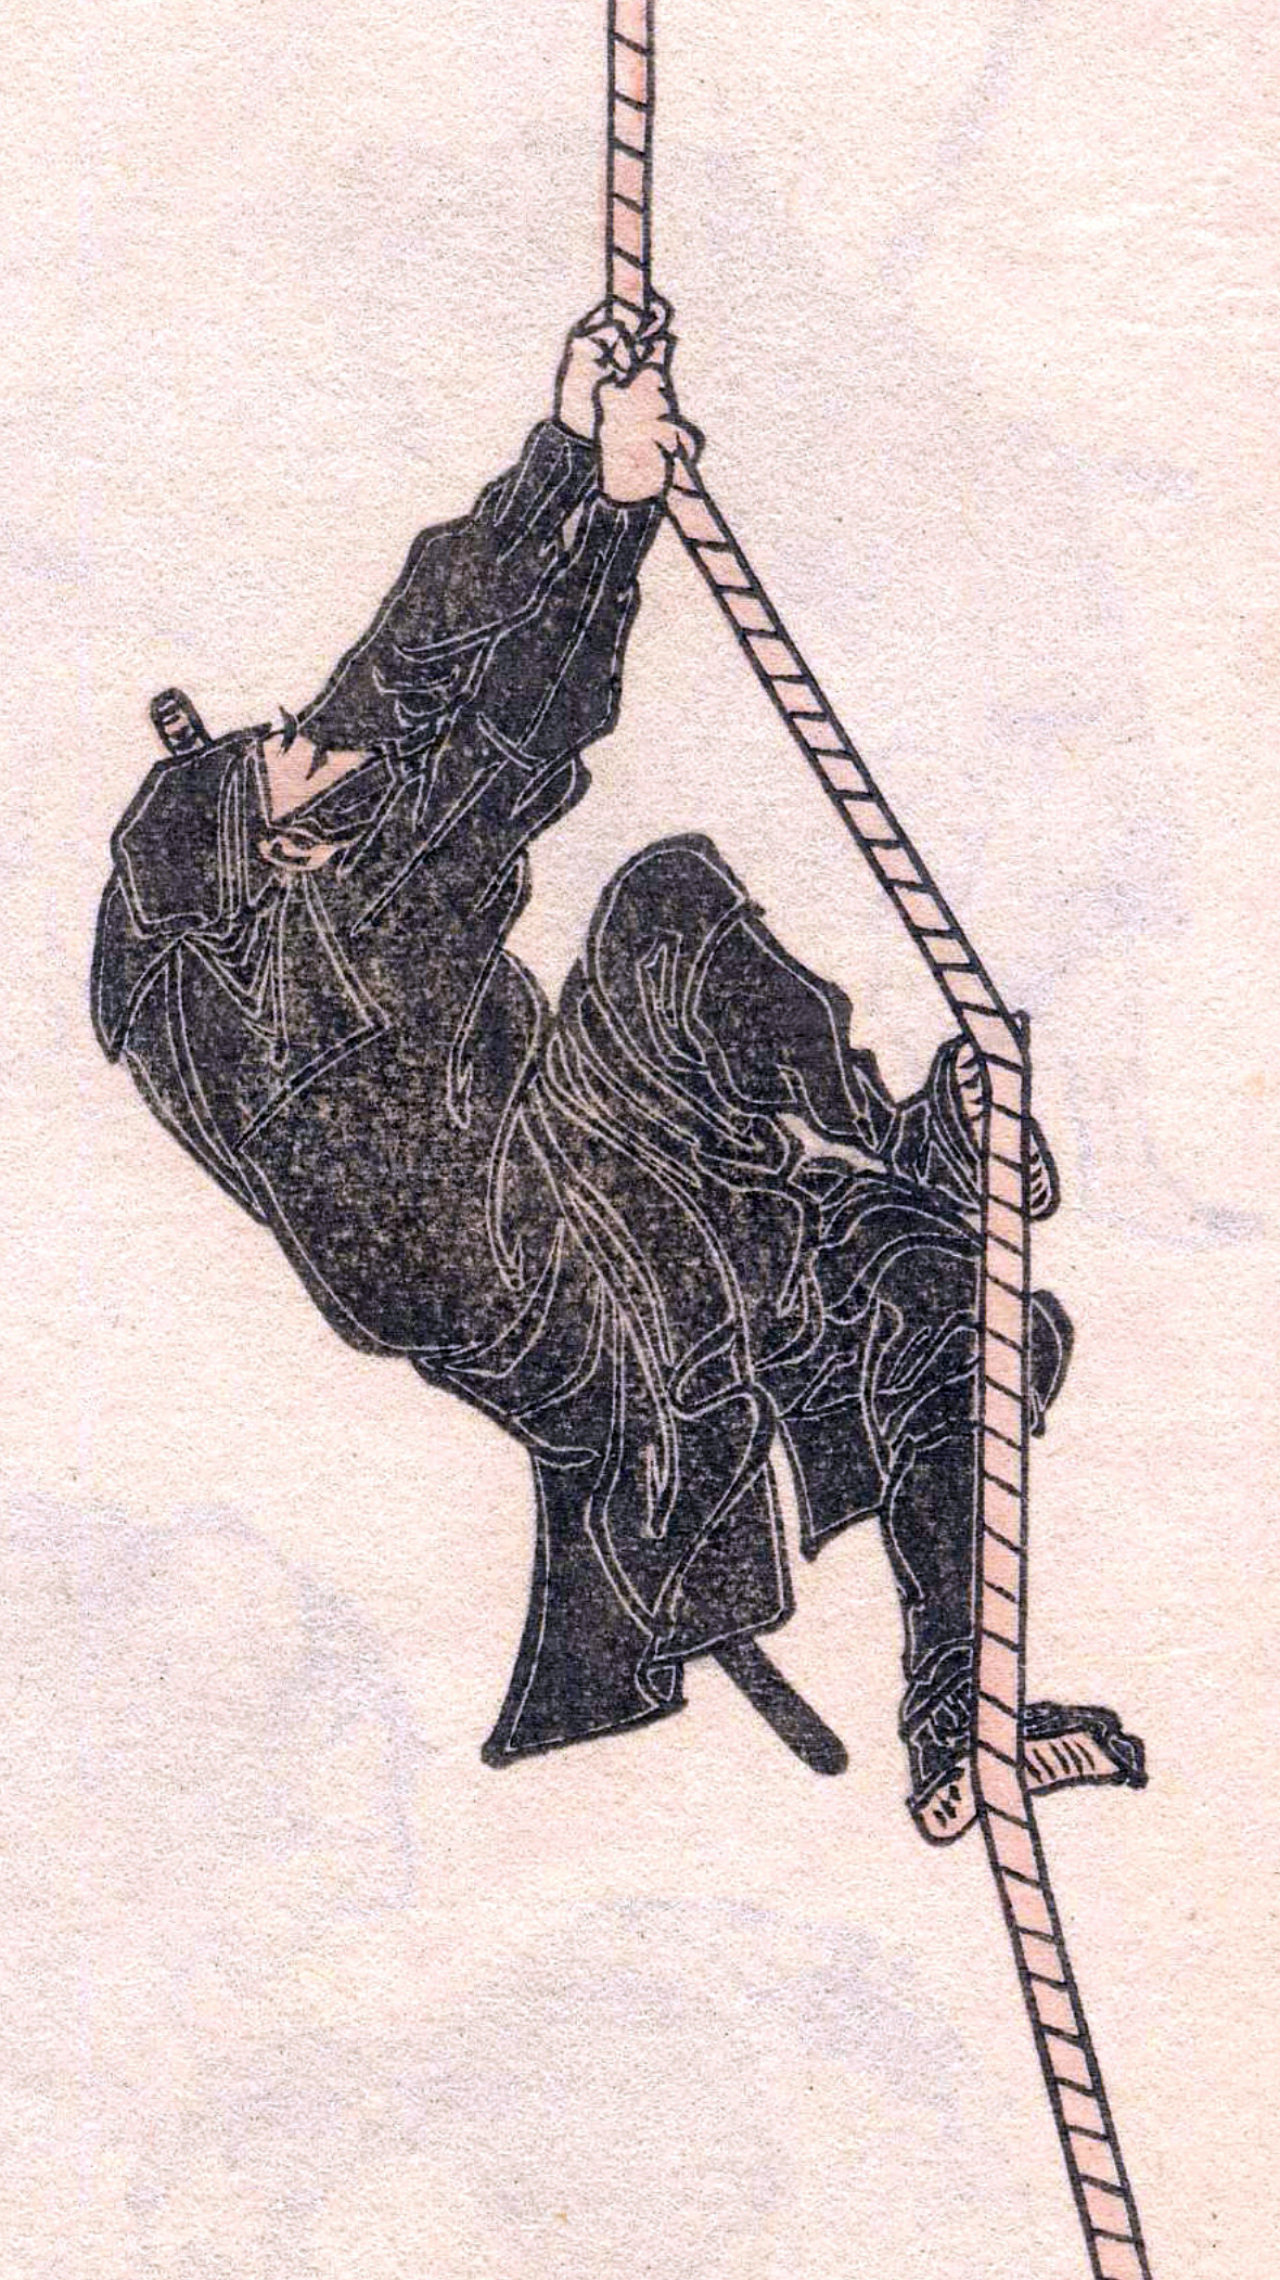 Ninja schets afbeelding van Katsushika Hokusai